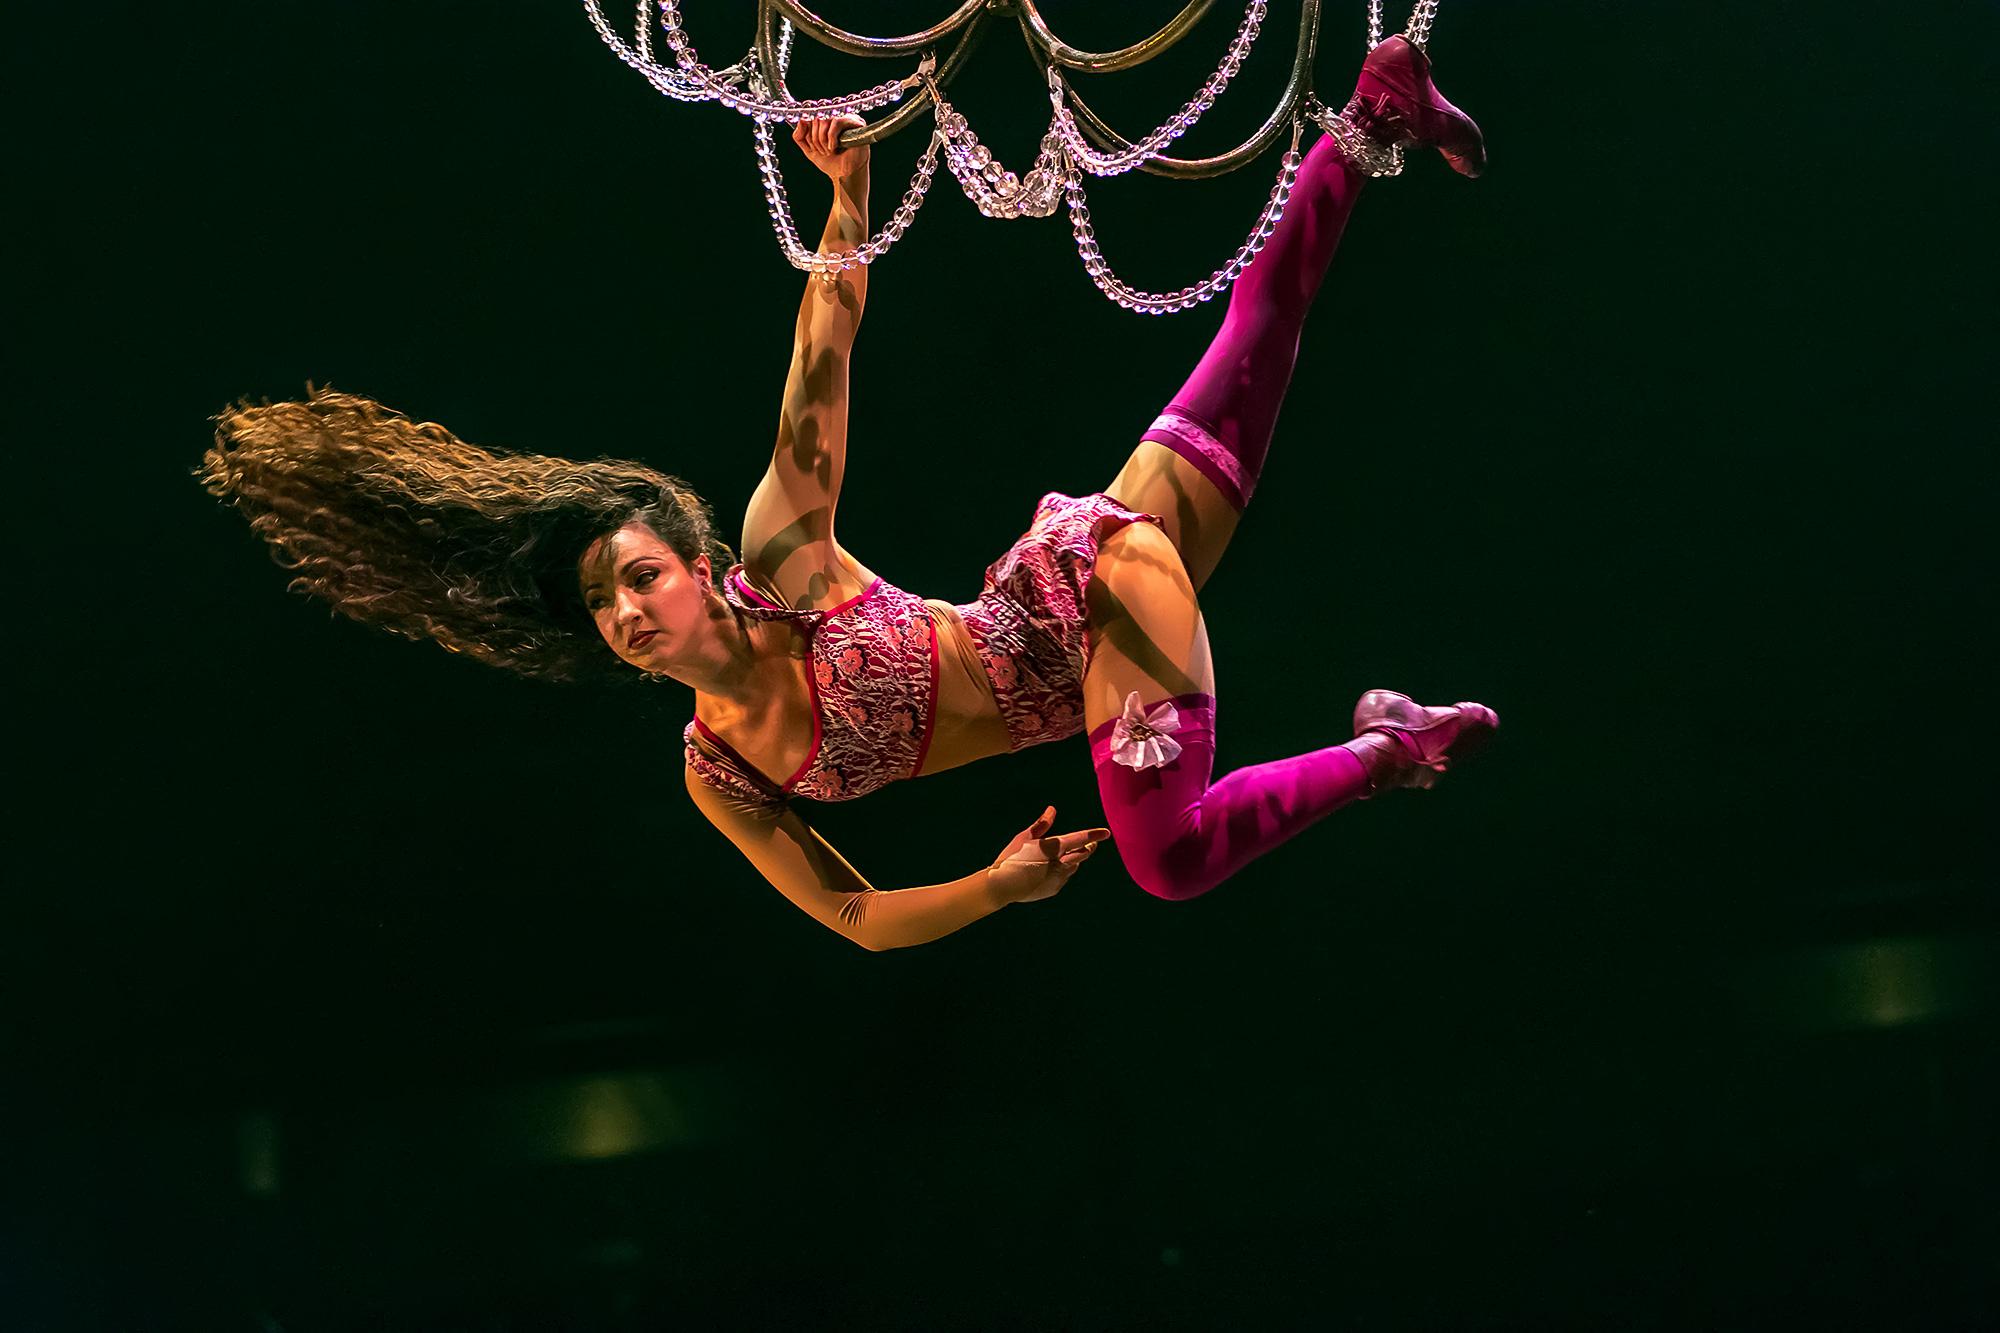 Five Reasons To See Cirque Du Soleil Corteo